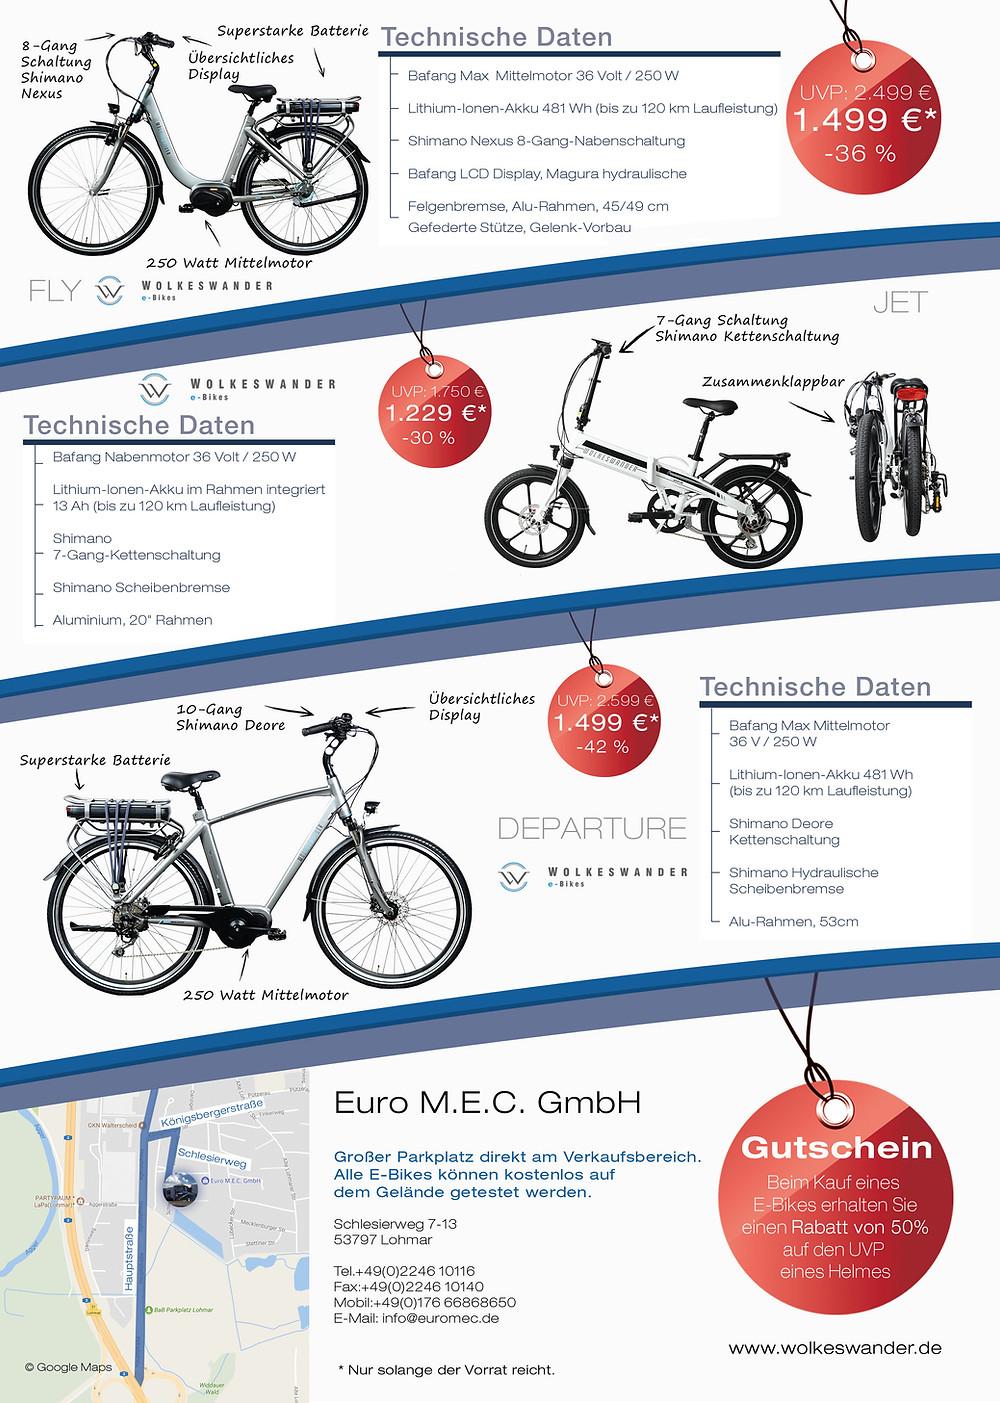 Euro M.E.C.  SSV Ebike Flyer